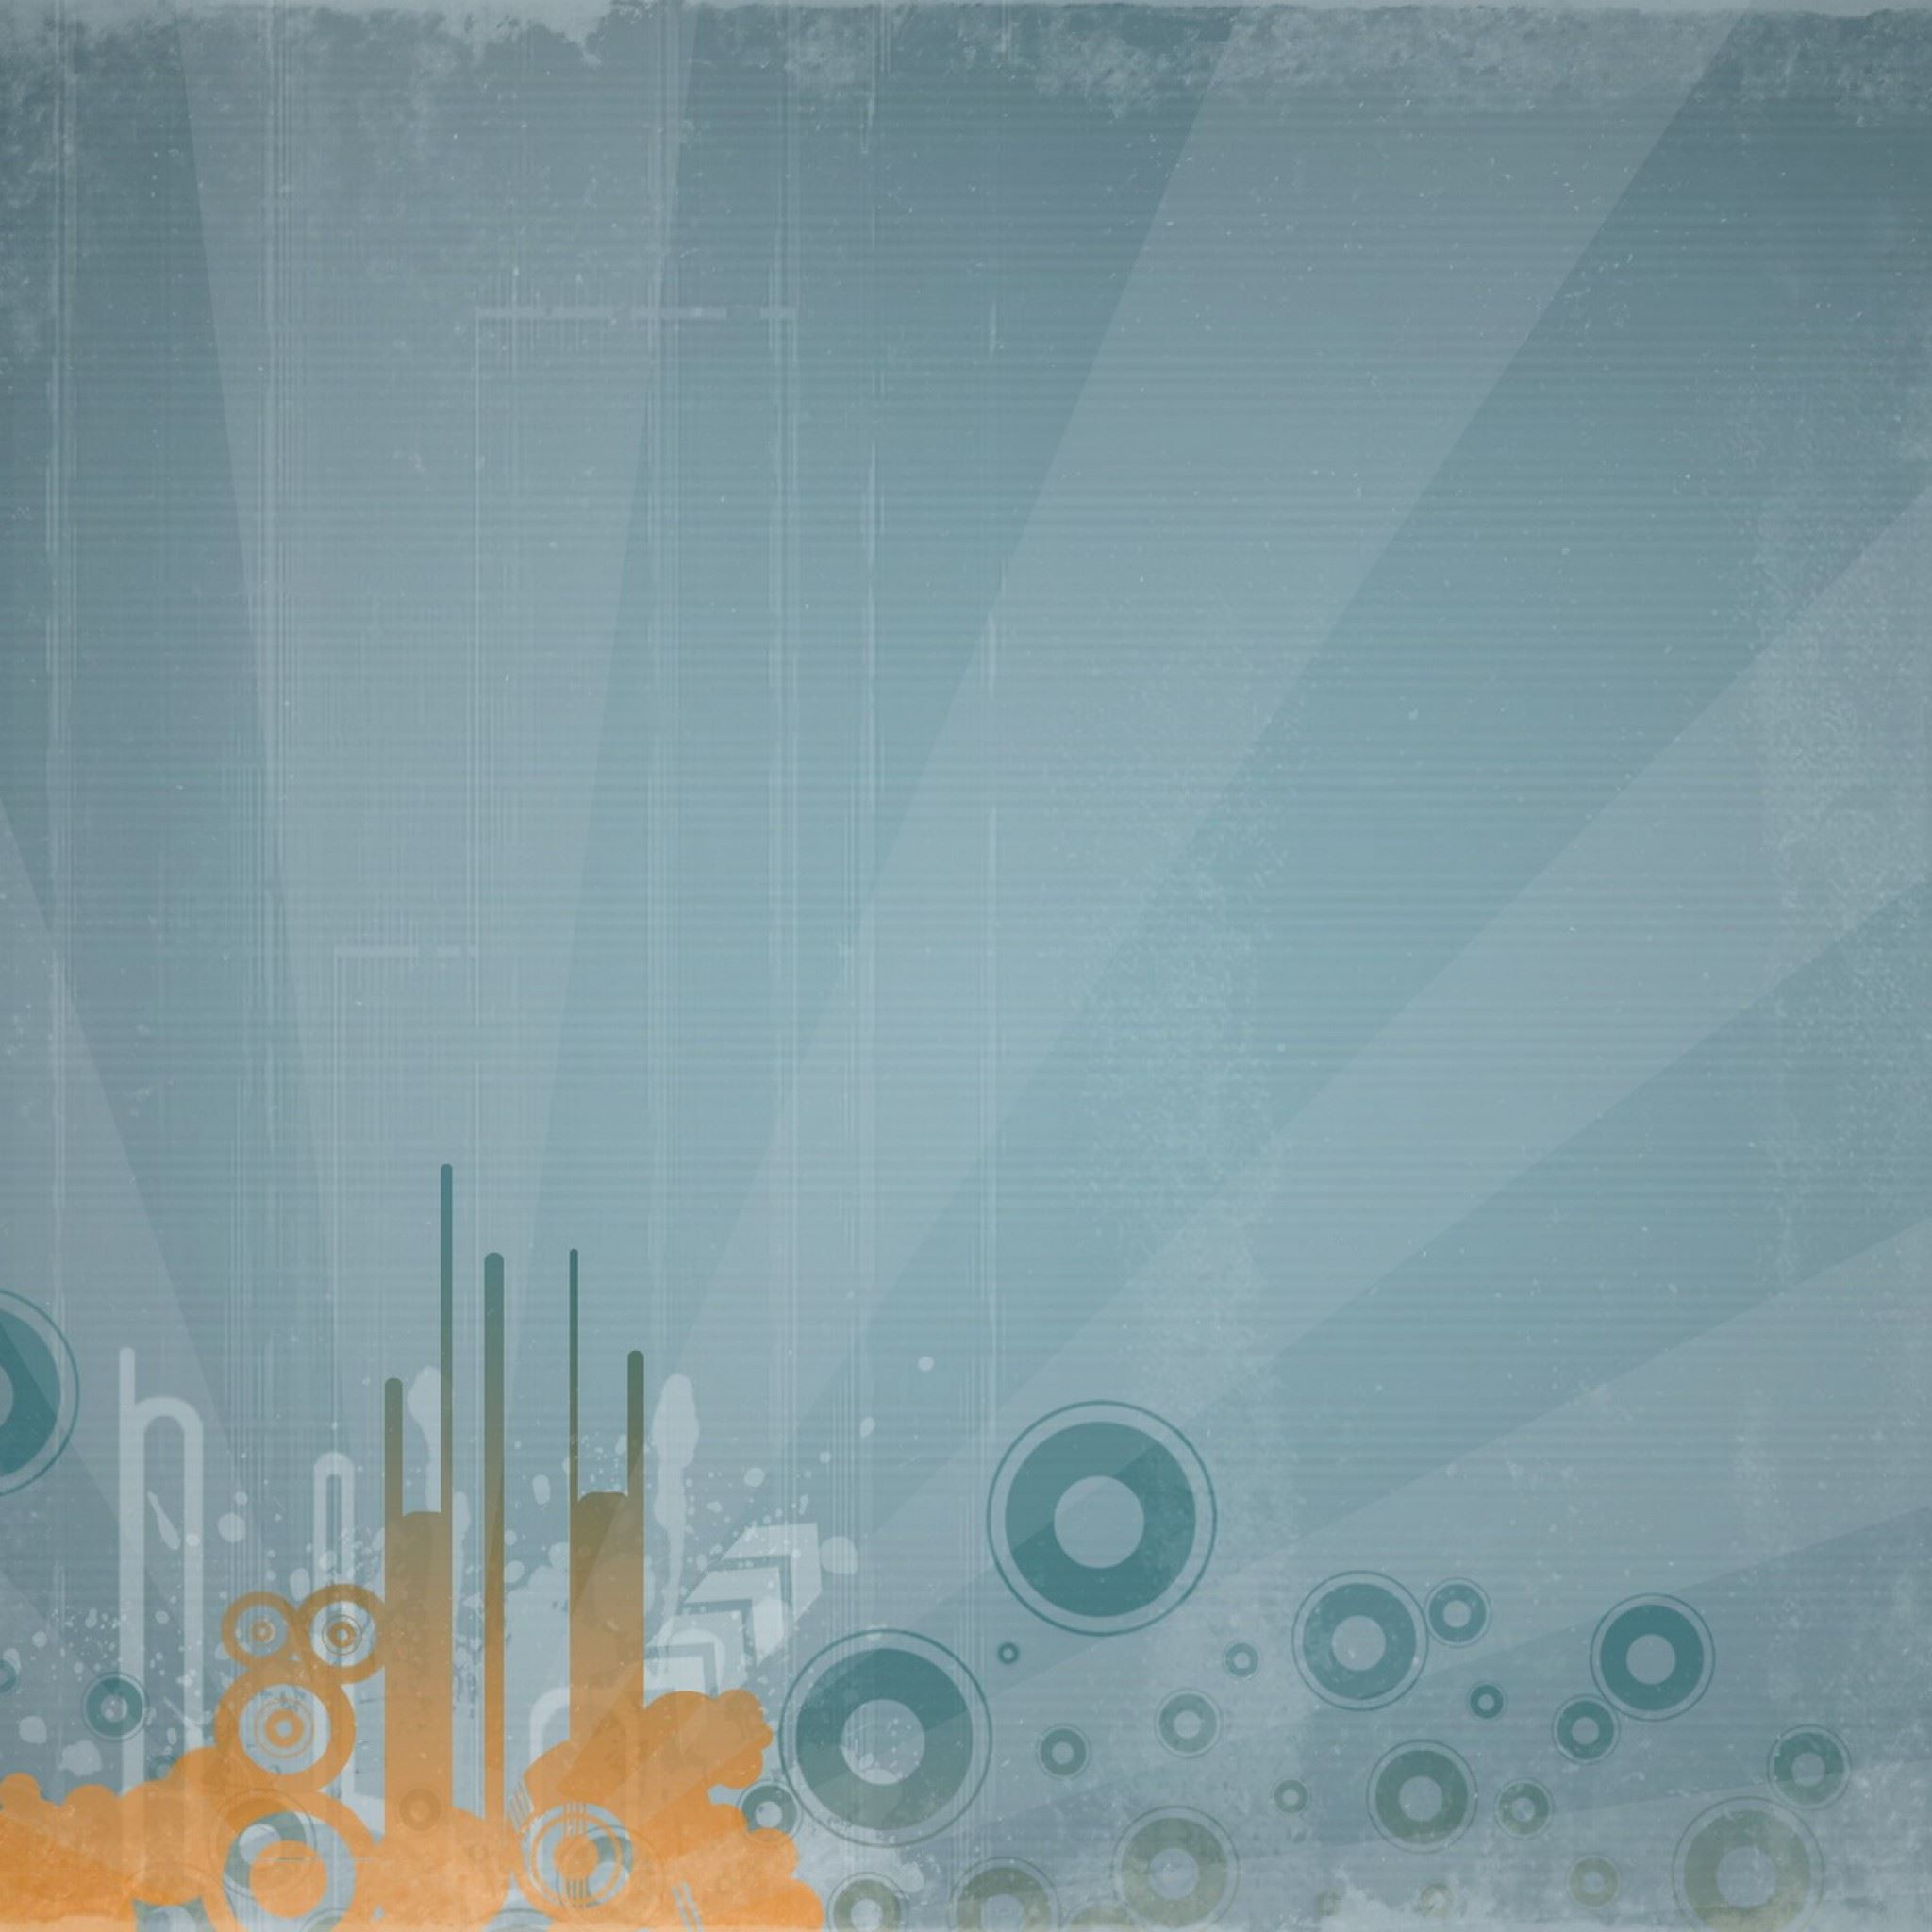 distressed ipad air wallpaper download iphone wallpapers ipad